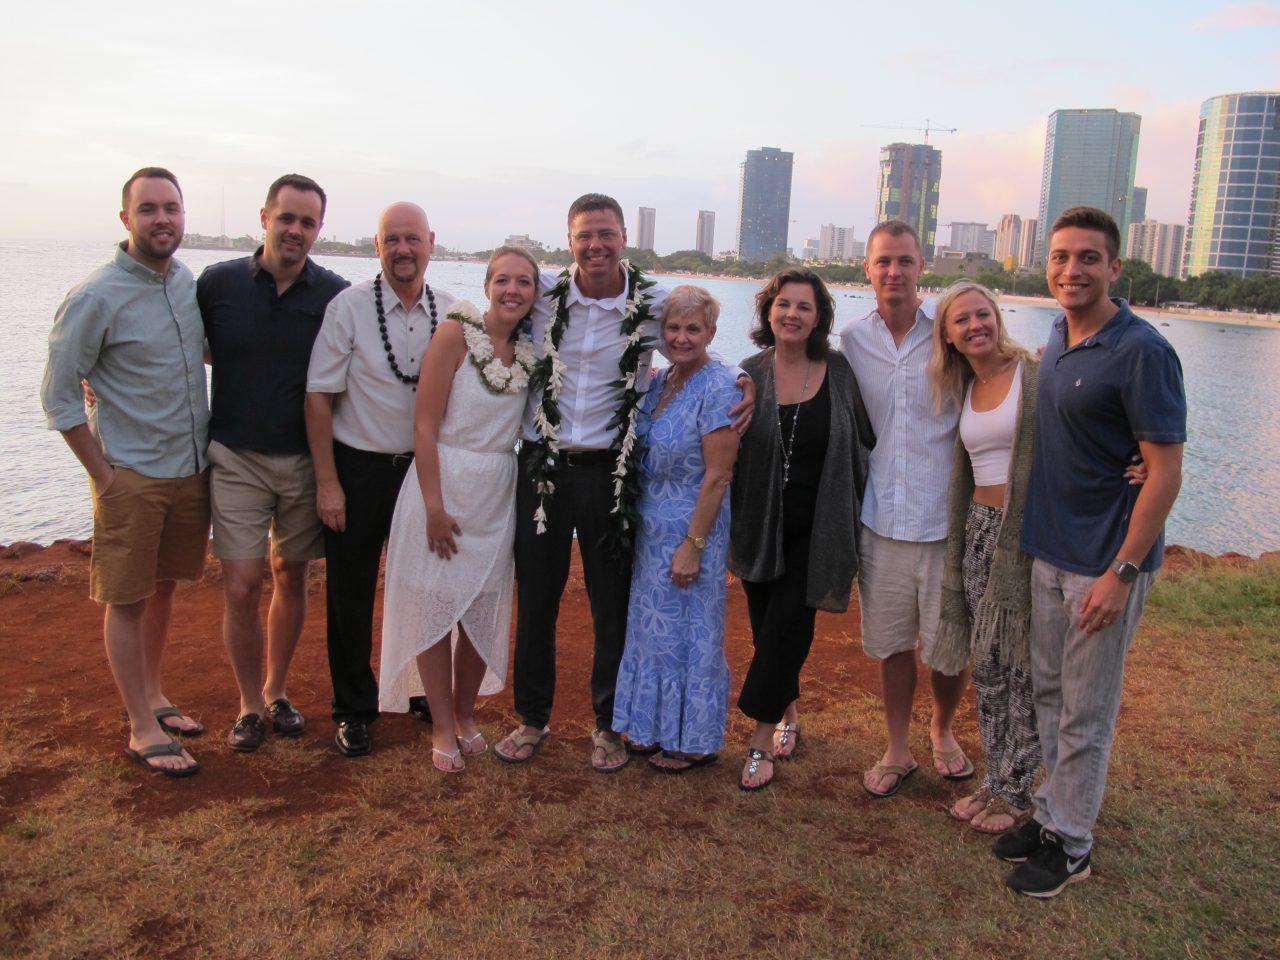 Pastor Barry's sister, Zanette and nephews, David & Joe